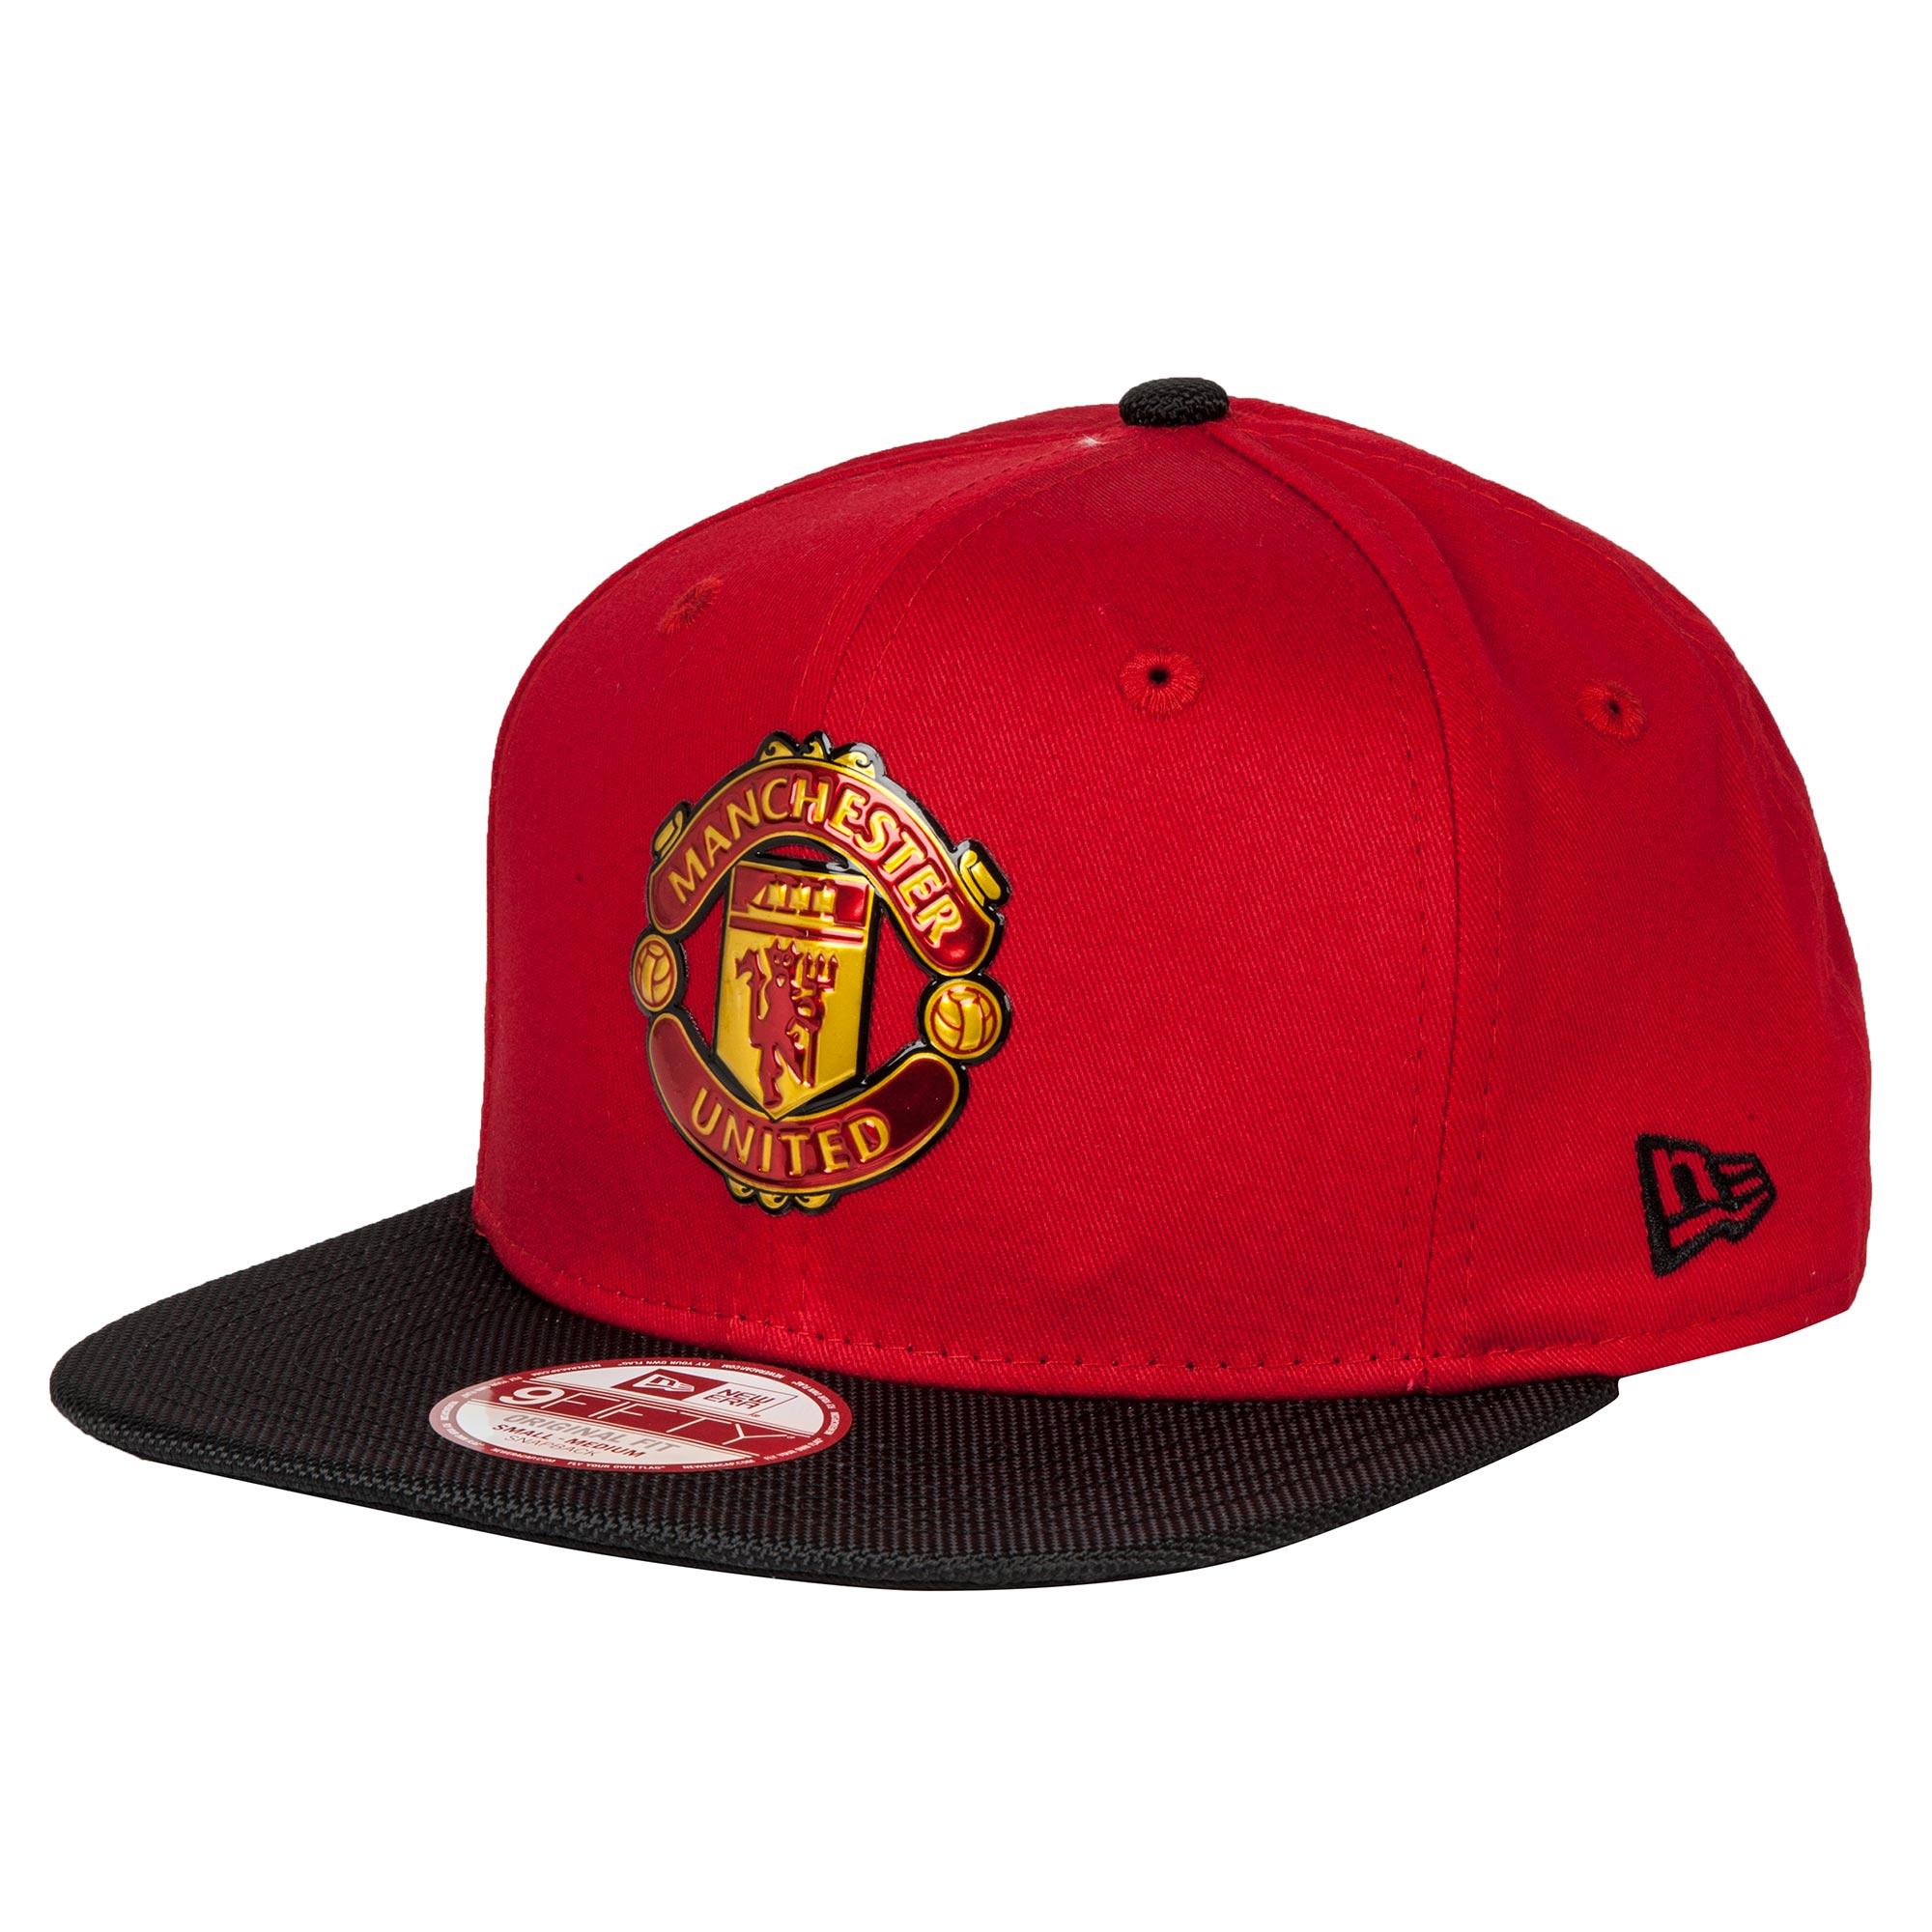 Manchester United New Era 9FIFTY Nylon - Snapback Cap - Red - Adult